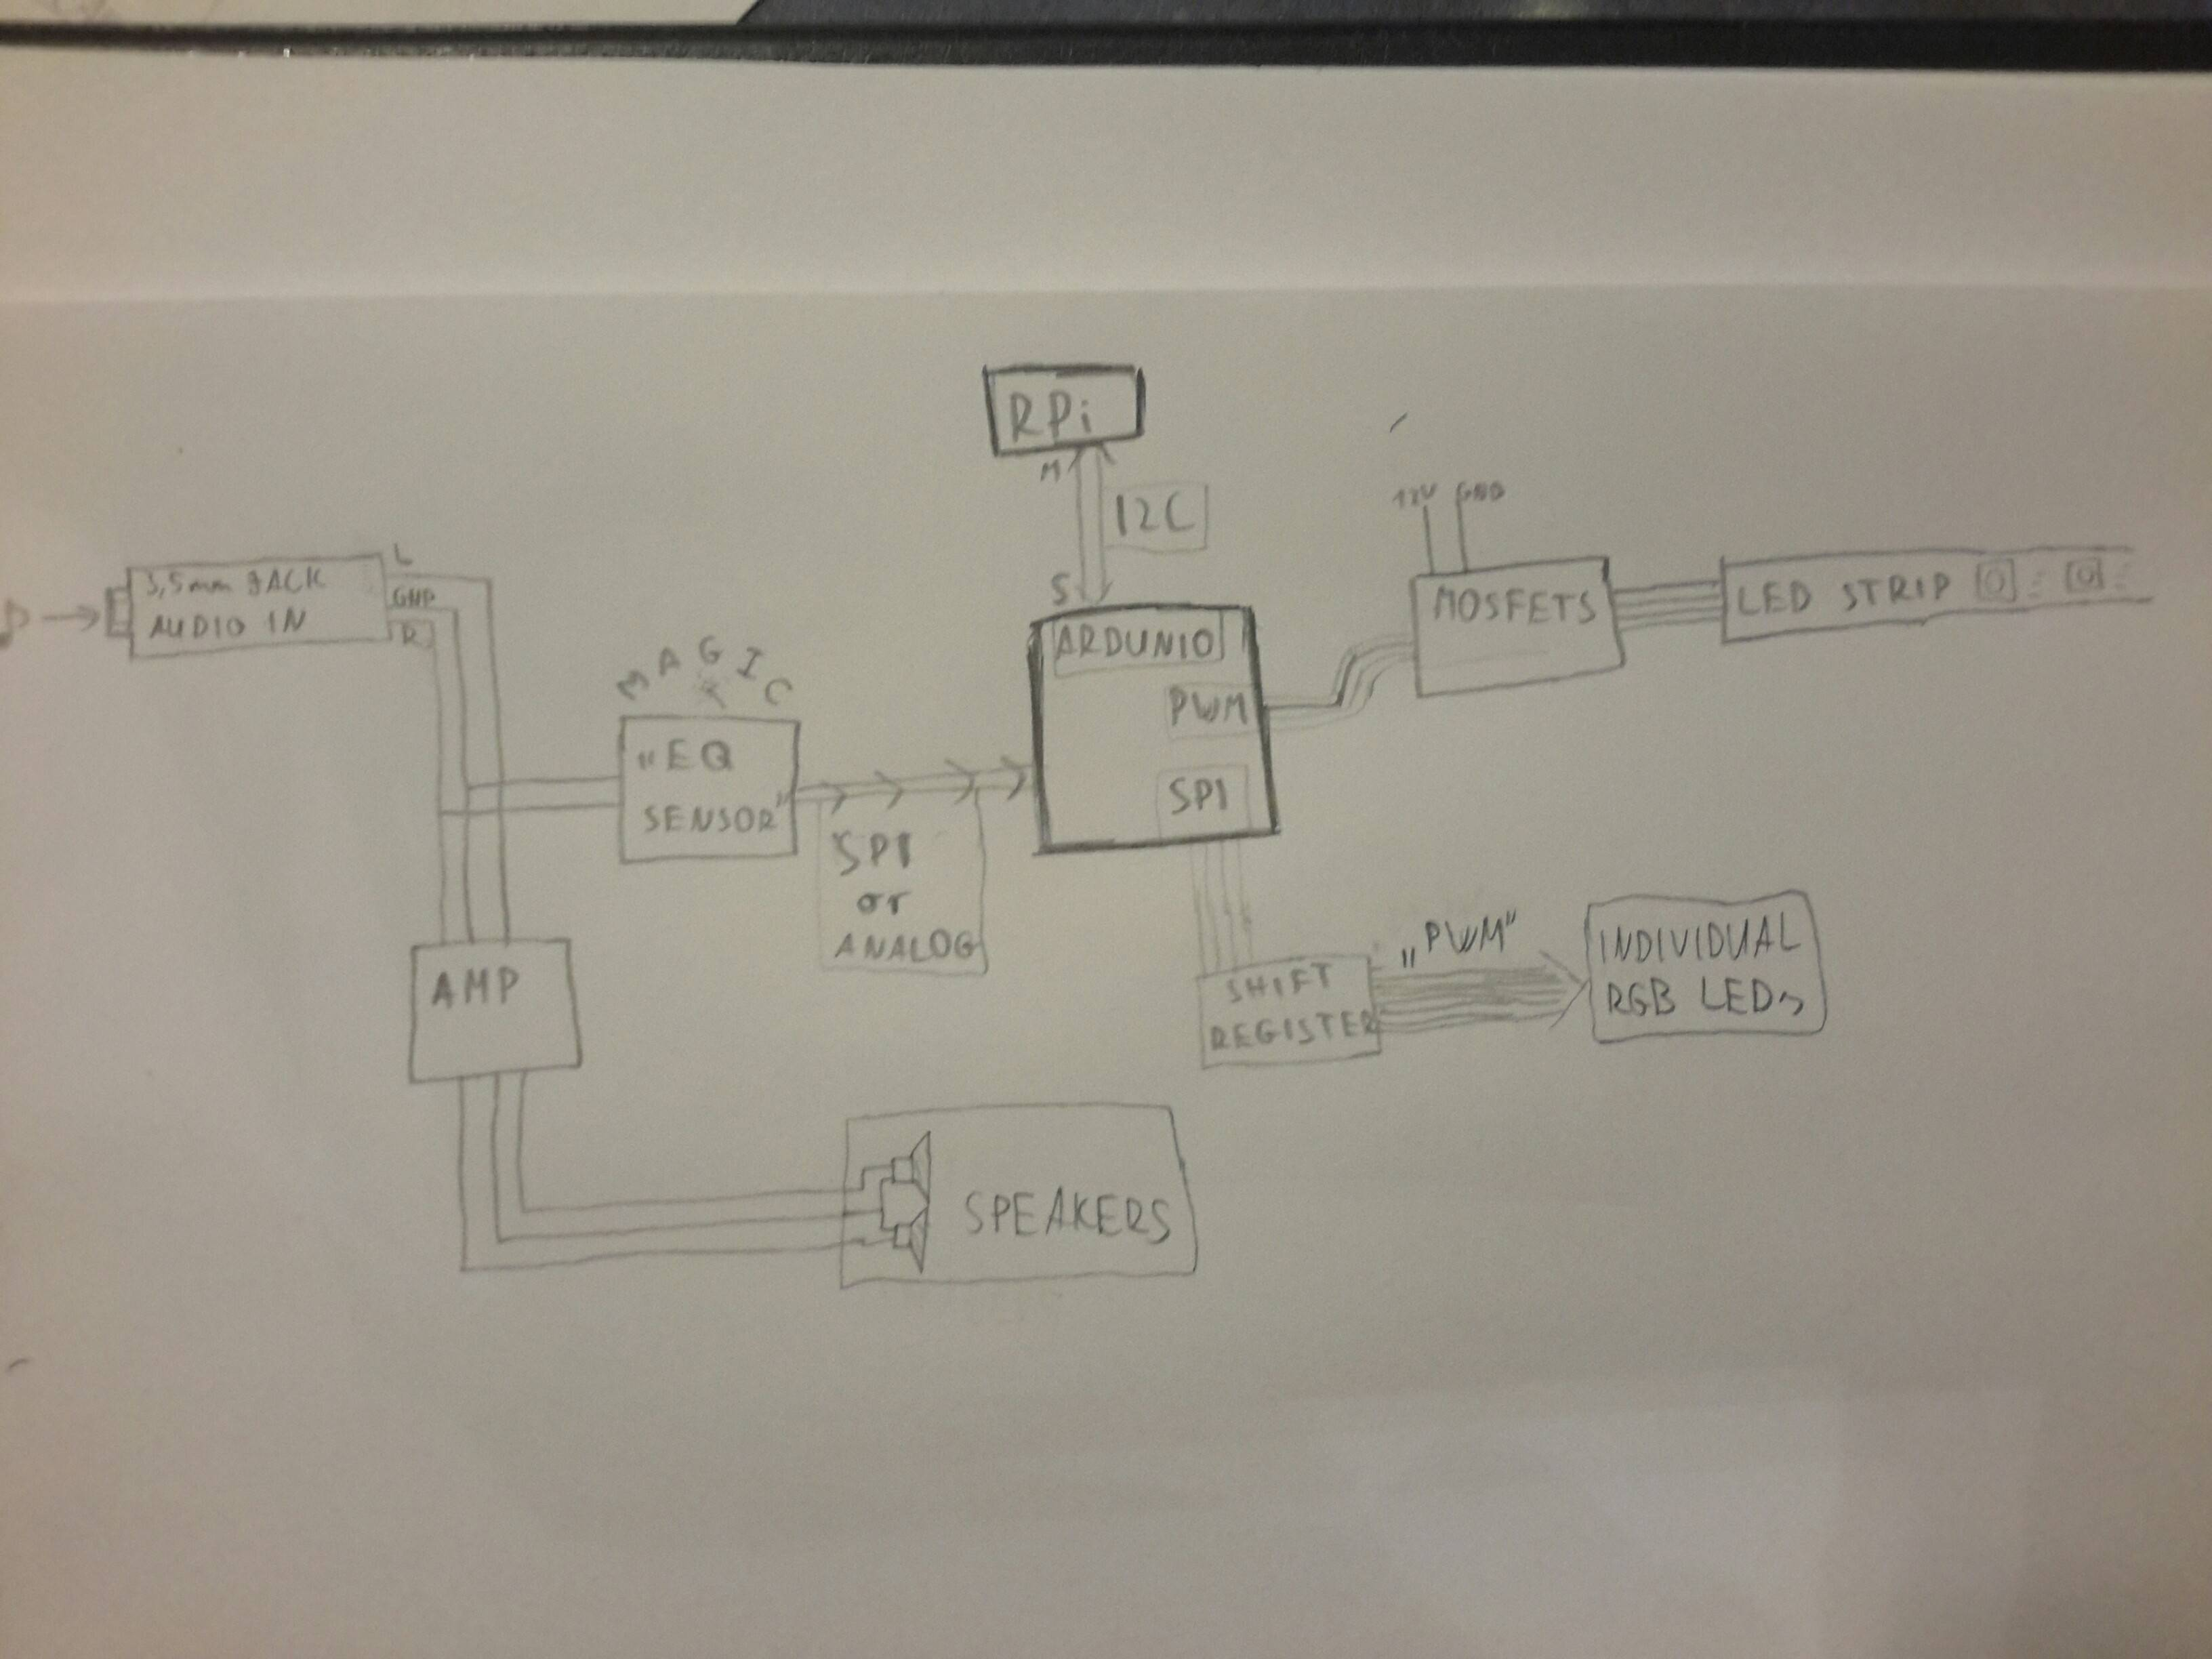 audio spectrum analyzer circuit diagram 2000 camaro engine analog how to build an sensor enter image description here led strip